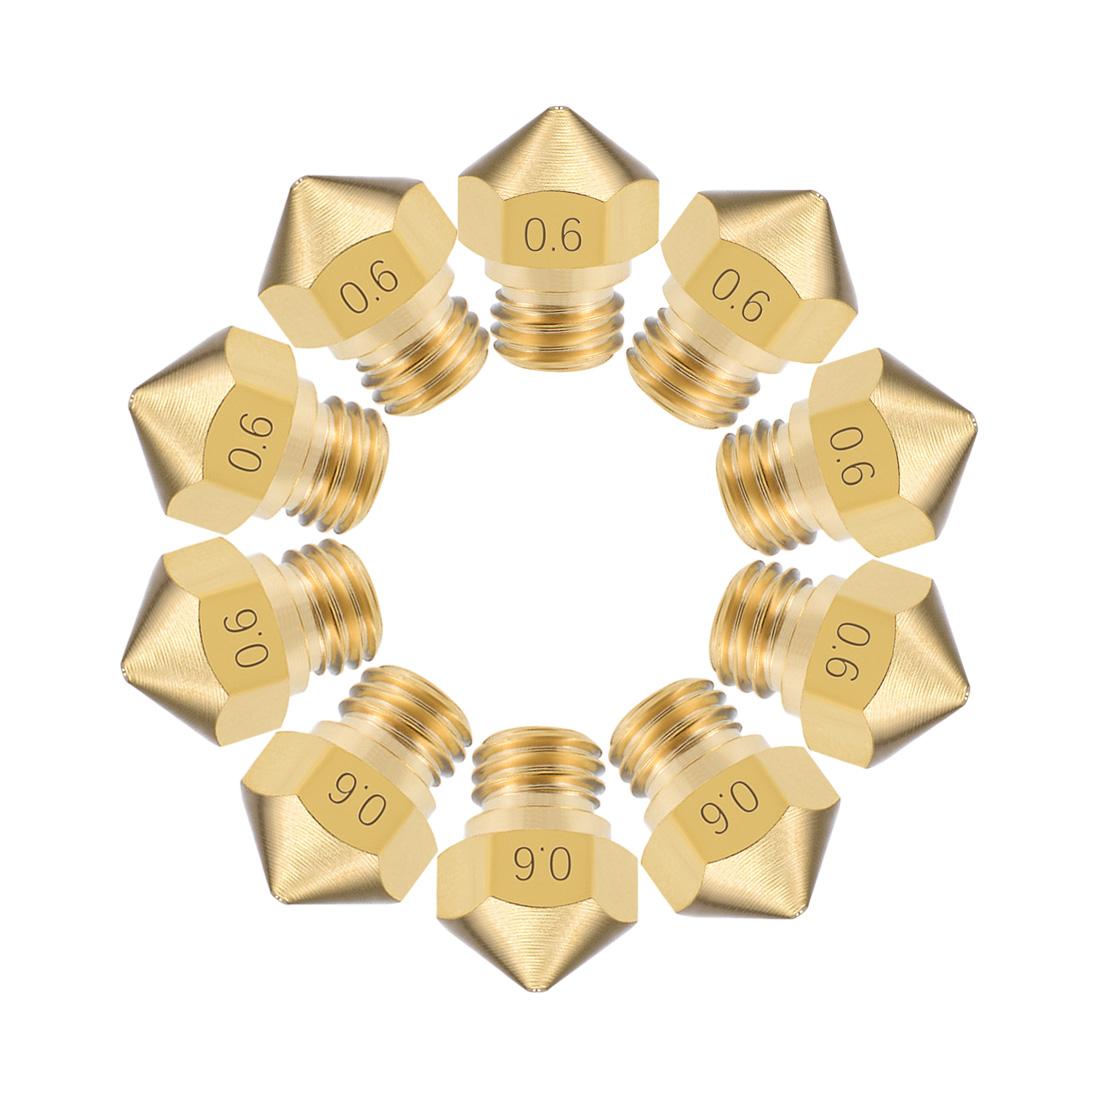 0.6mm 3D Printer Nozzle Head M7 Thread for MK10 1.75mm Extruder Print Brass 10pc